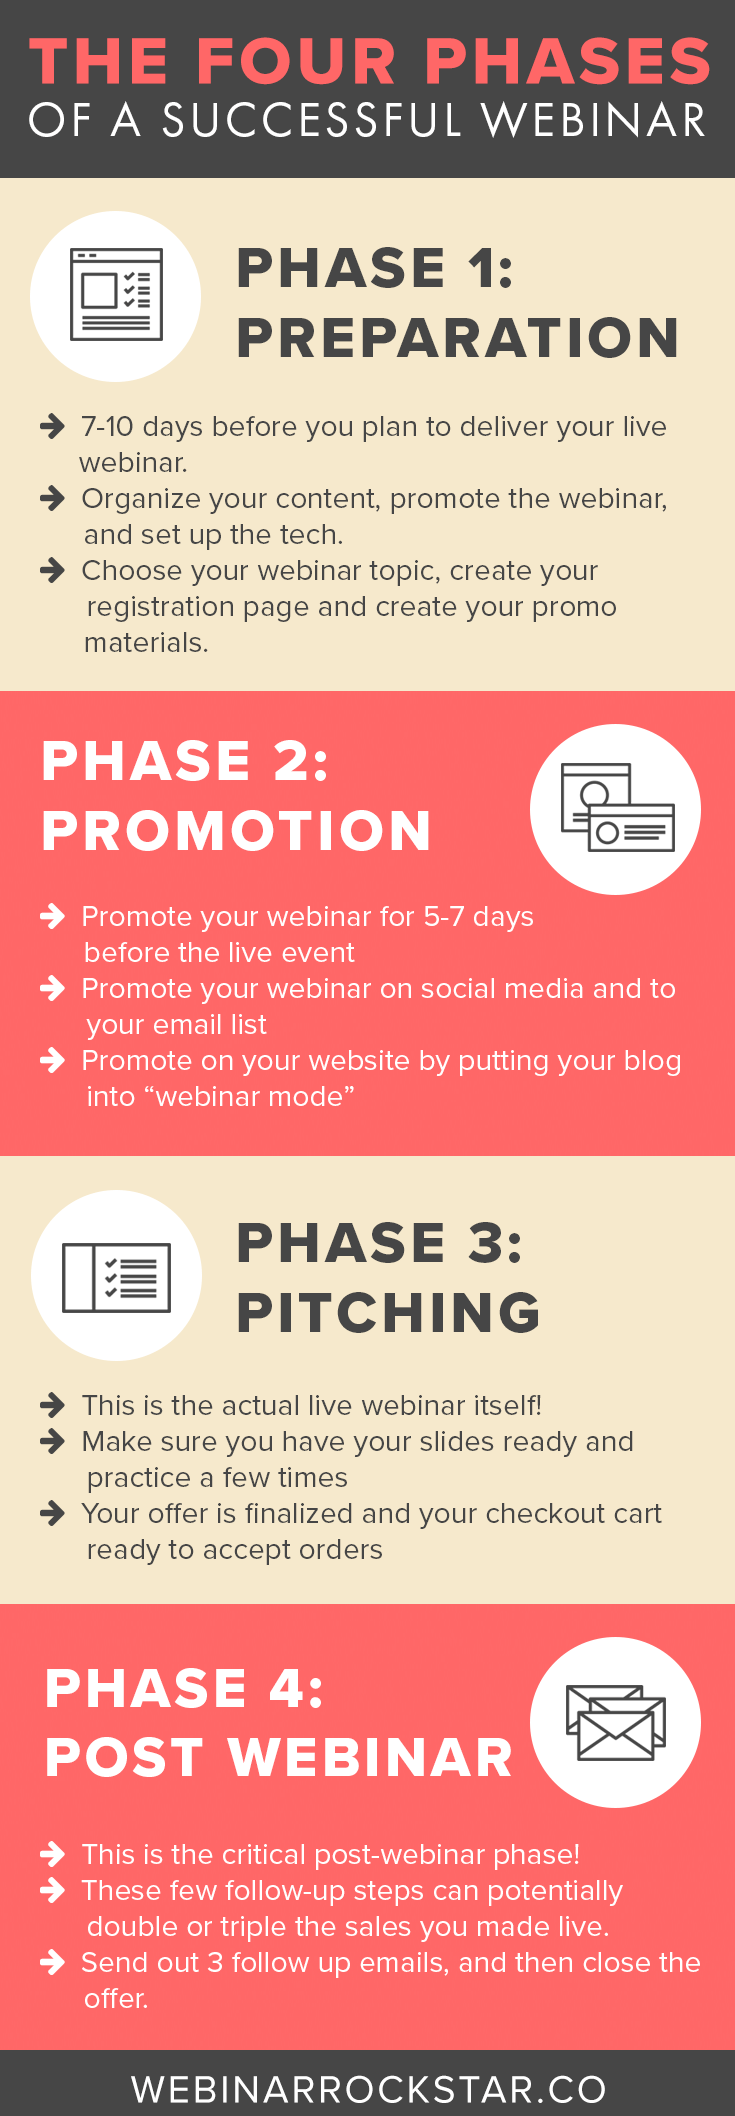 How To Host A Webinar The Four P S Of Webinars Mariah Coz In 2020 Webinar Marketing Video Marketing Business Webinar